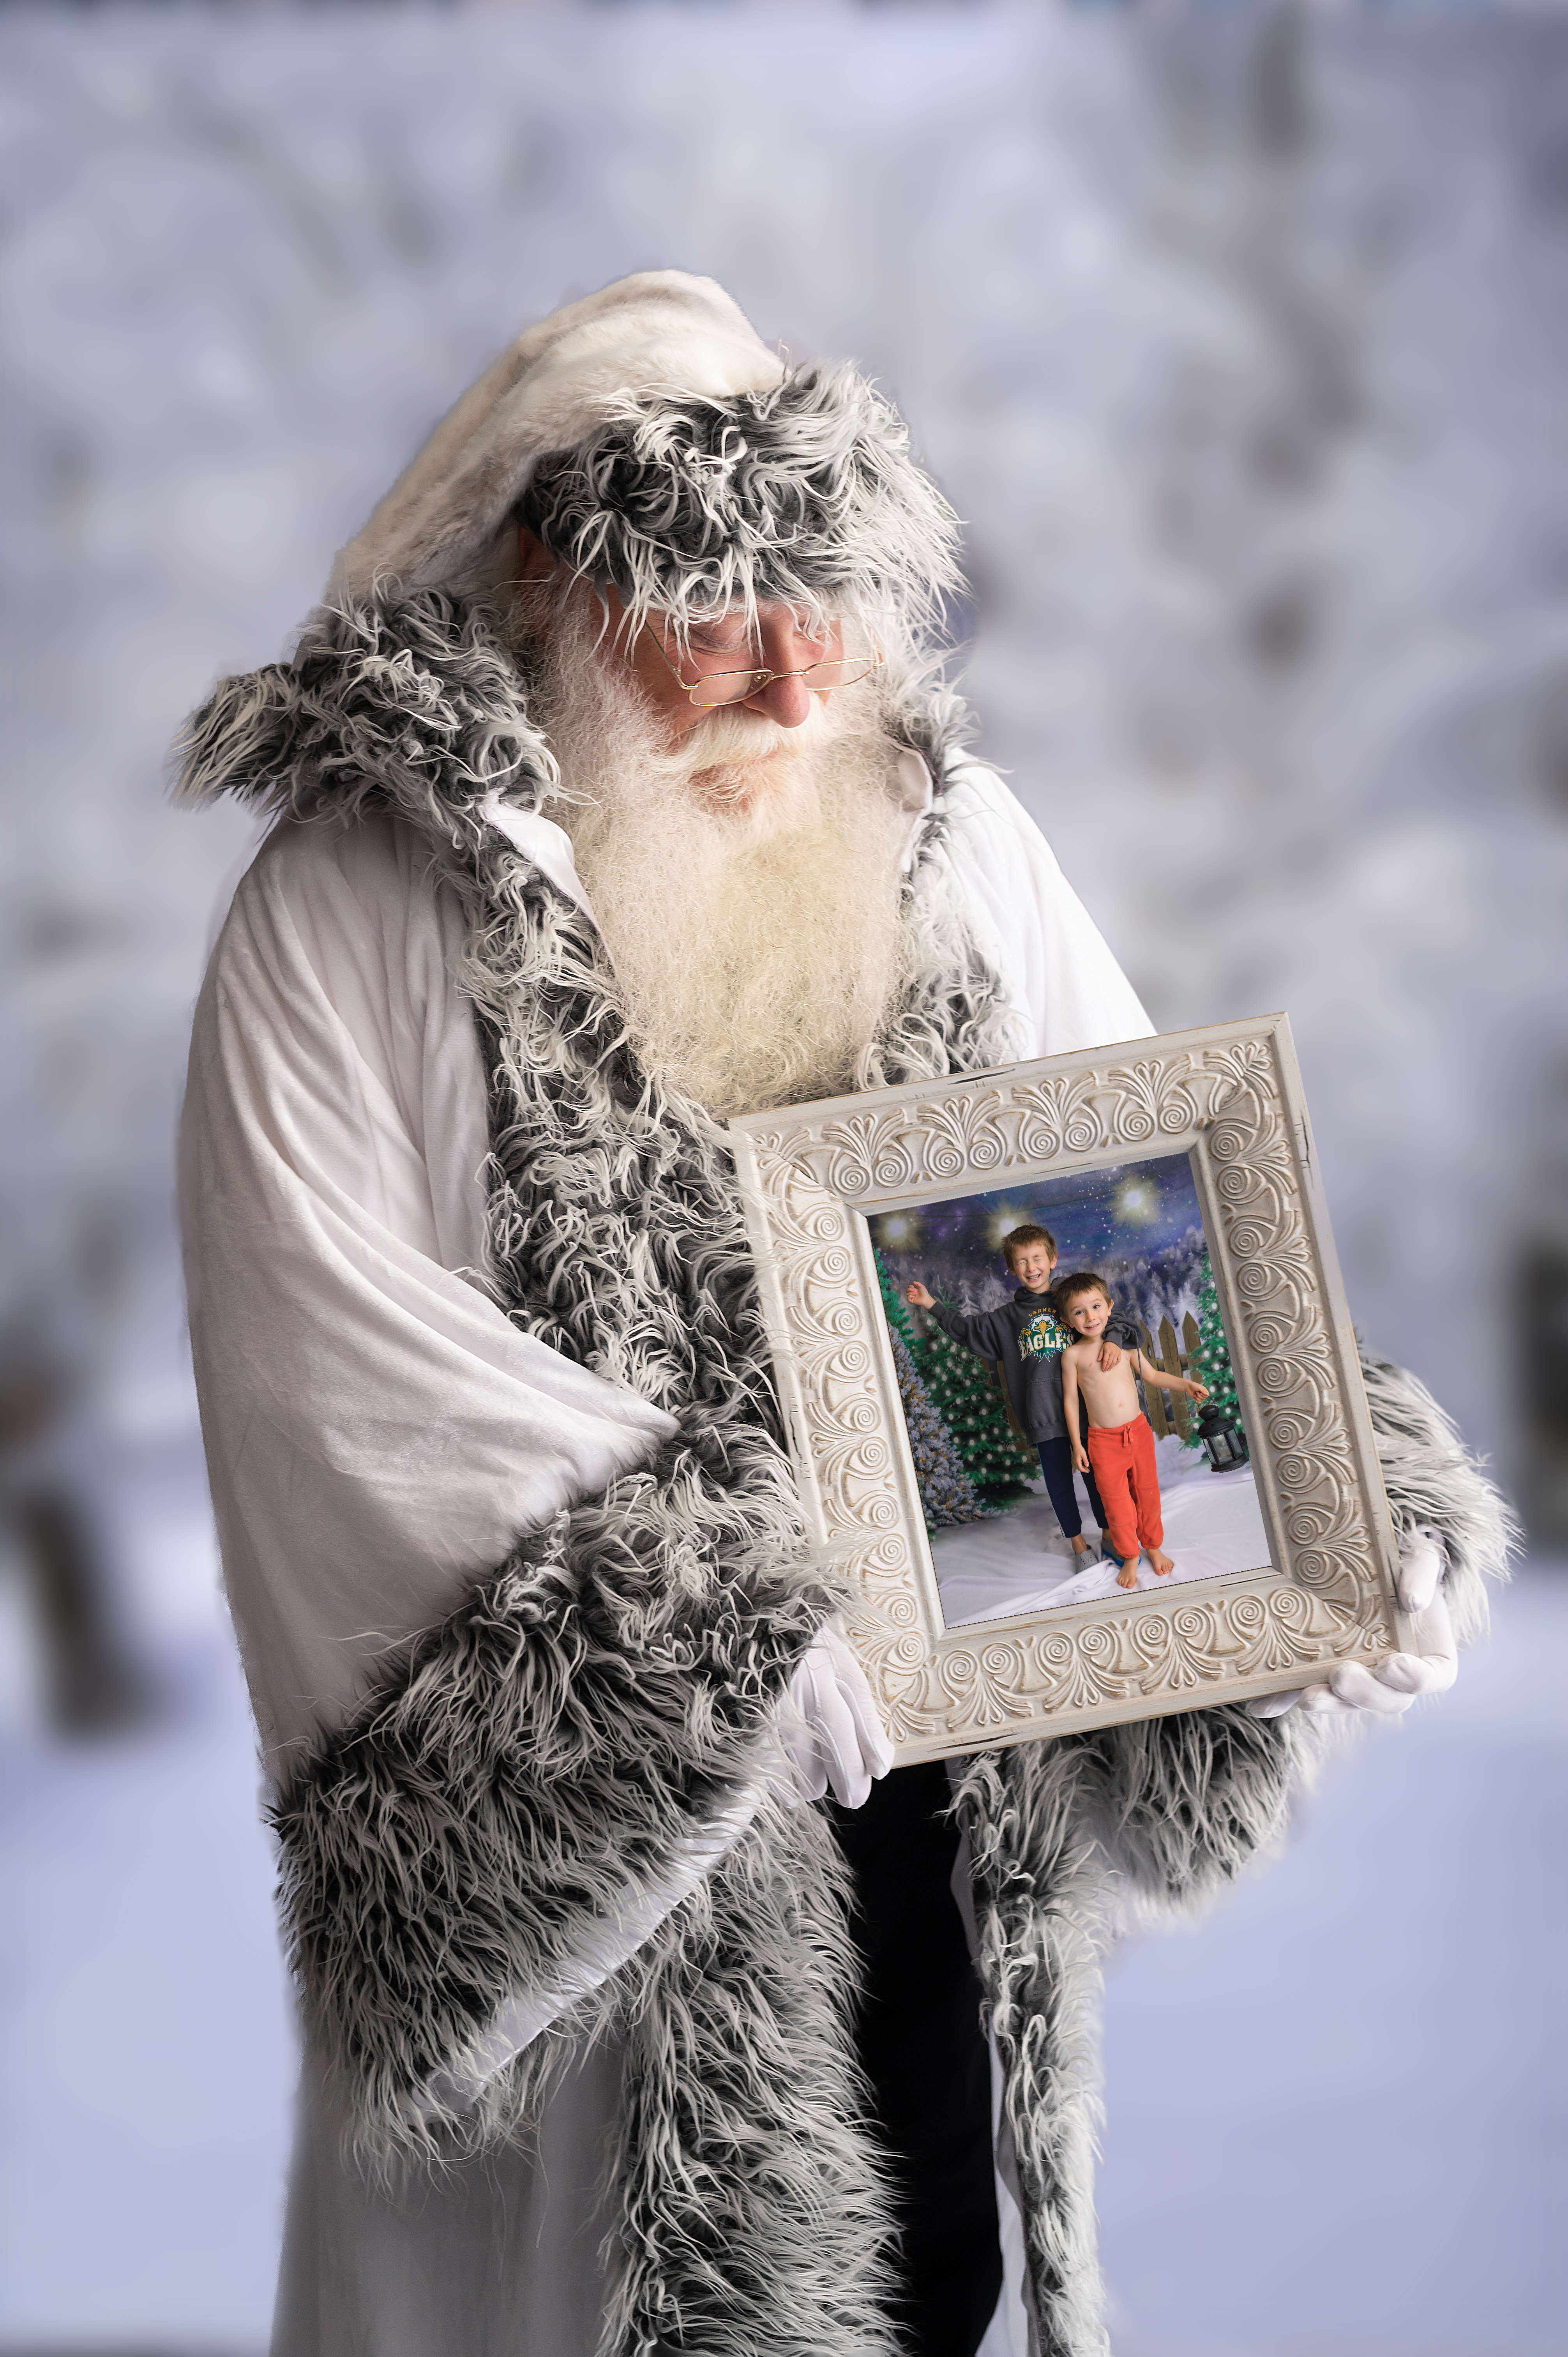 #2 - Snowy Santa